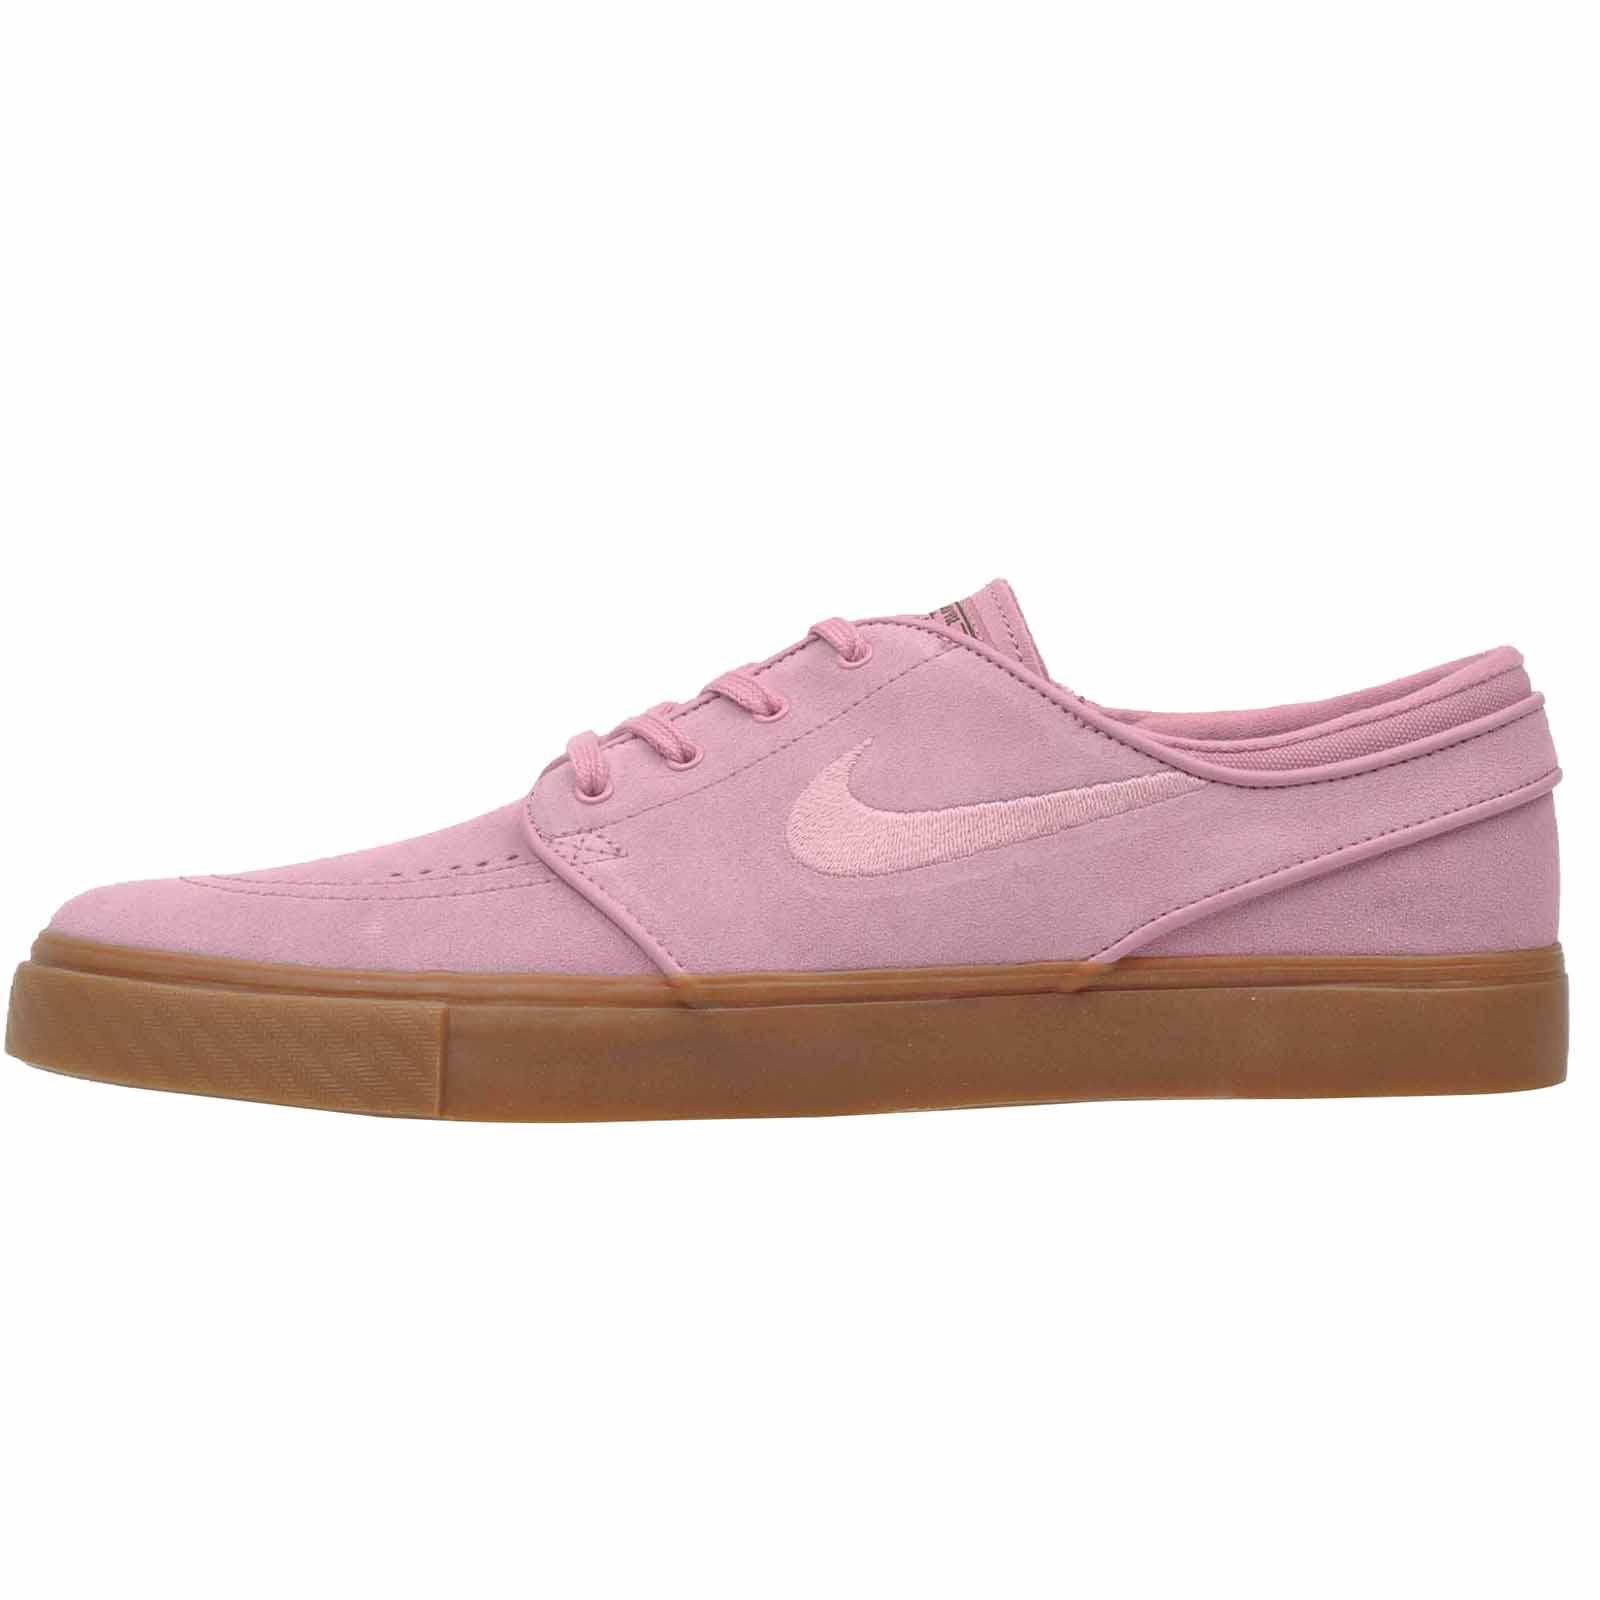 711a7608347 Nike Zoom Stefan Janoski Skate Boarding Mens Shoes SB Pink 333824 ...